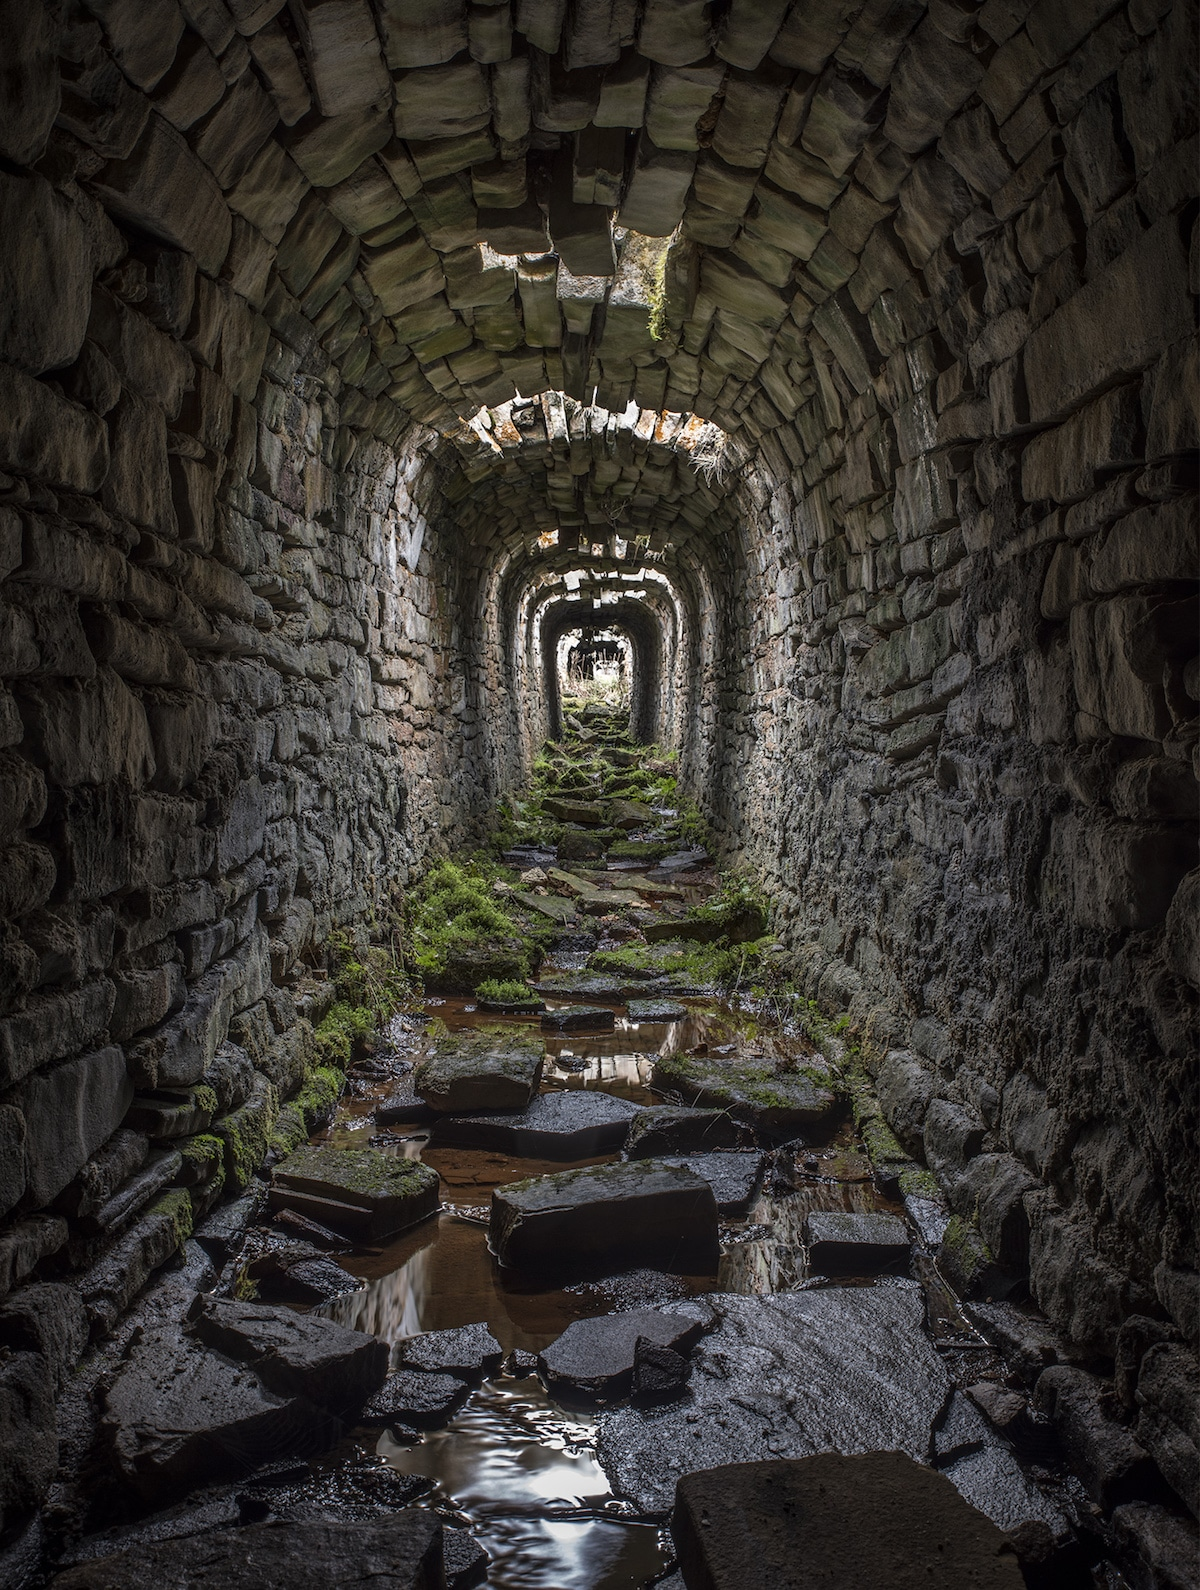 Abandoned Lead Mine by Matt Emmett